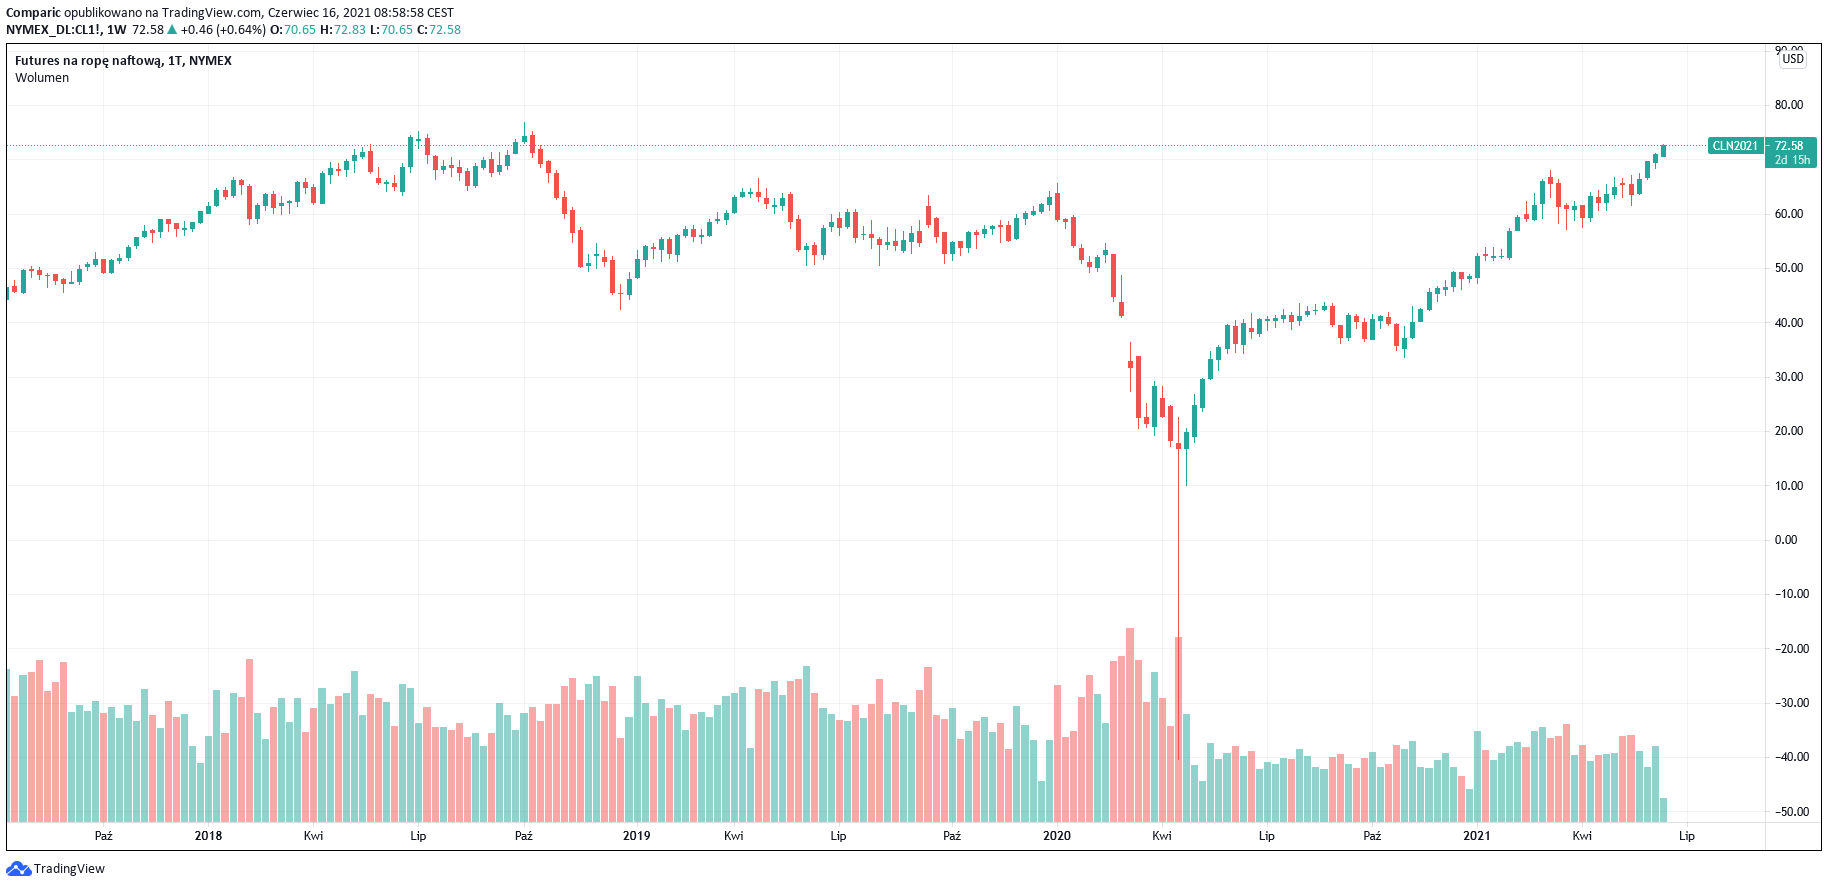 Cena ropy naftowej Brent blisko 75 dol. za baryłkę! To najdrożej od 2018 rokuk/kUG8vP6D.png